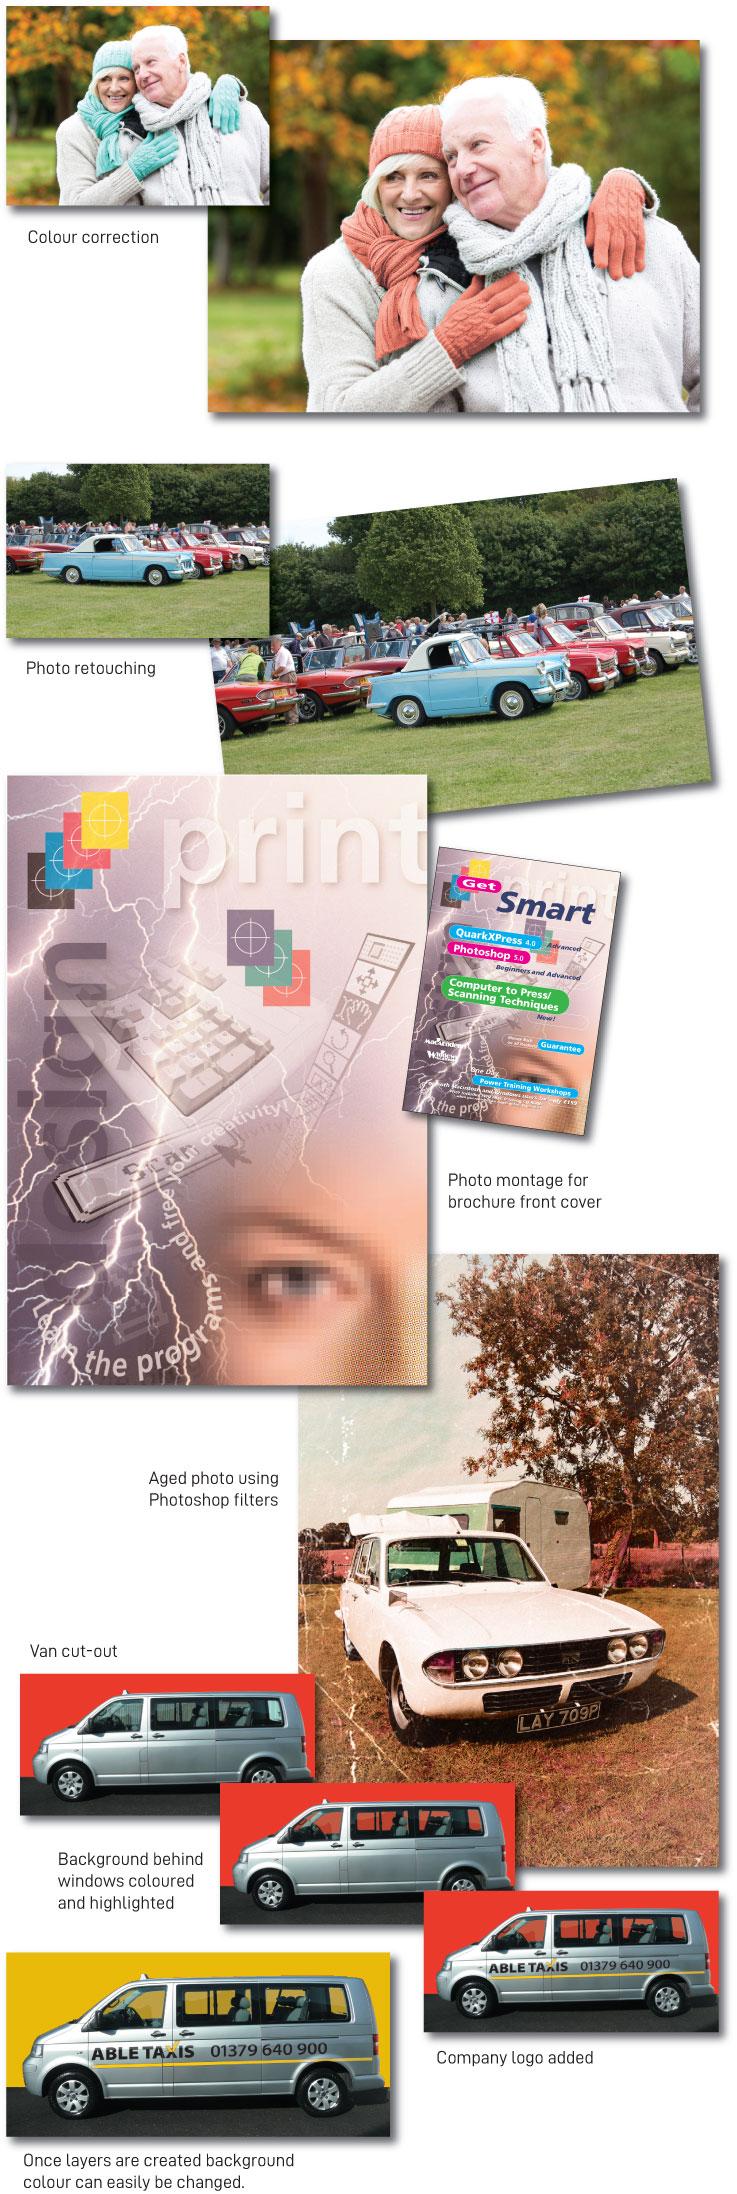 Adobe Photoshop retouching colour correction examples